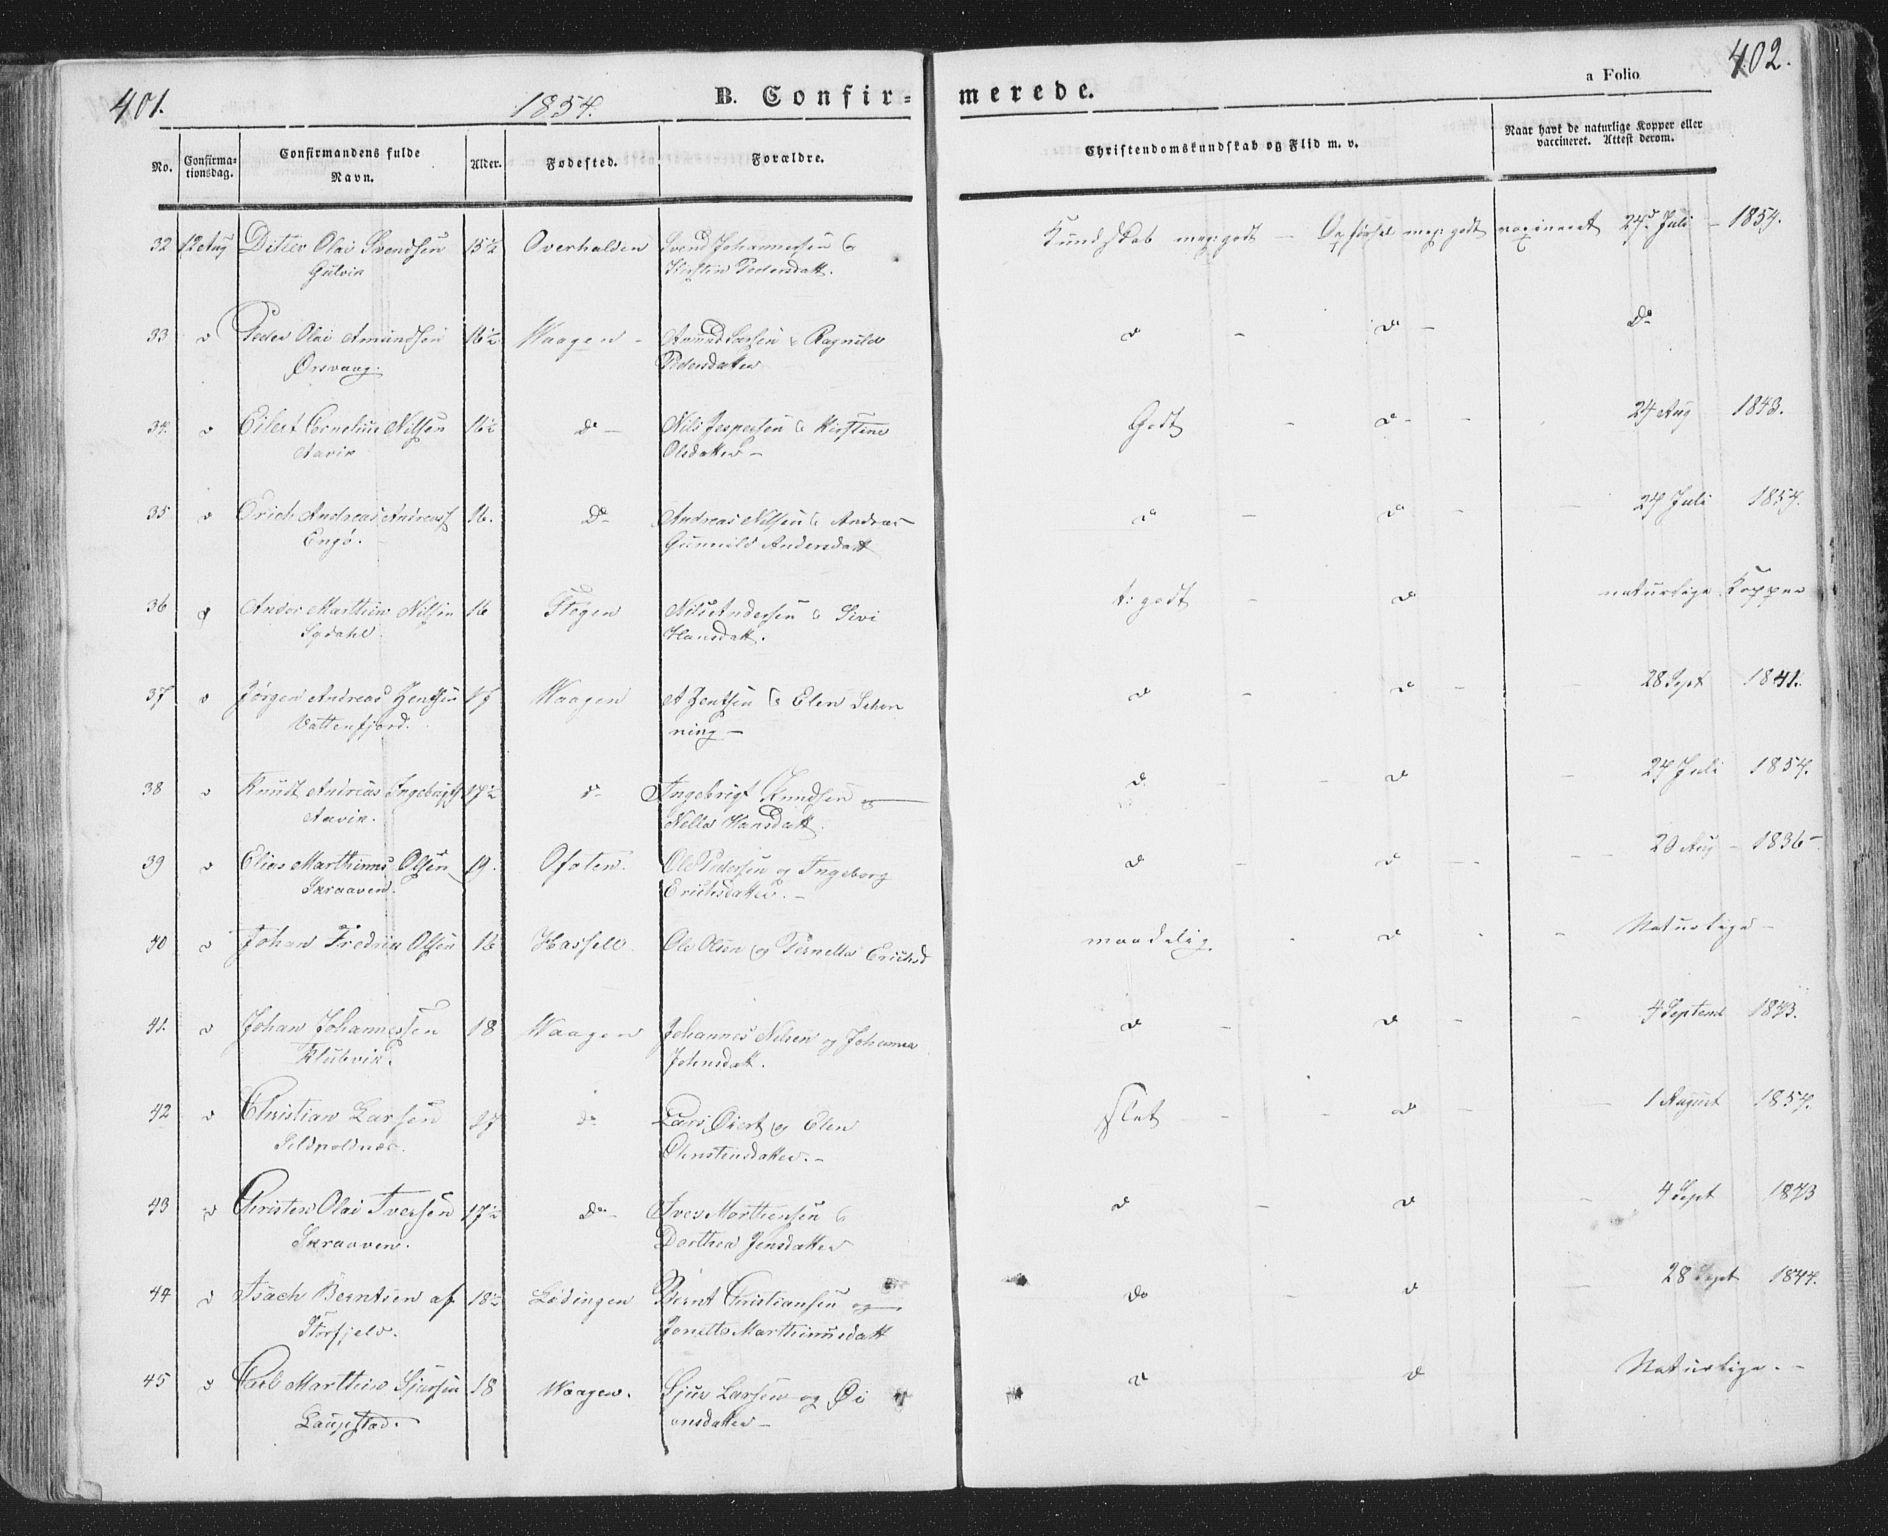 SAT, Ministerialprotokoller, klokkerbøker og fødselsregistre - Nordland, 874/L1072: Klokkerbok nr. 874C01, 1843-1859, s. 401-402